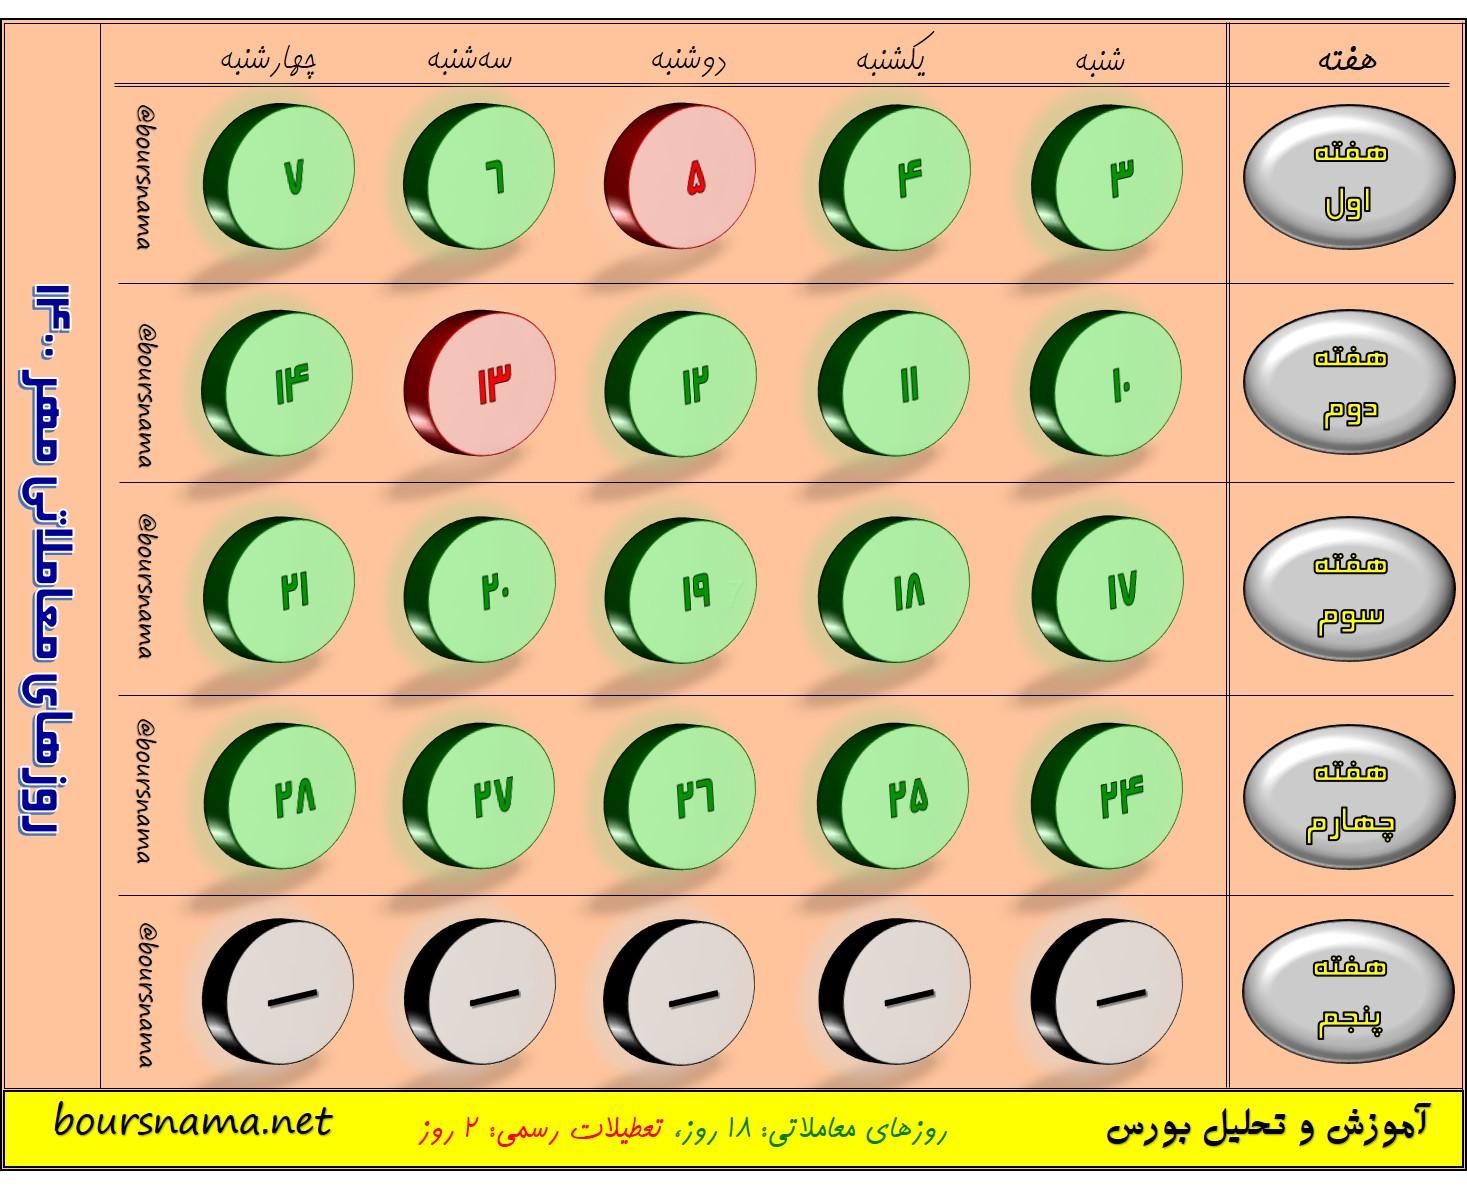 تقویم معاملاتی بورس مهر